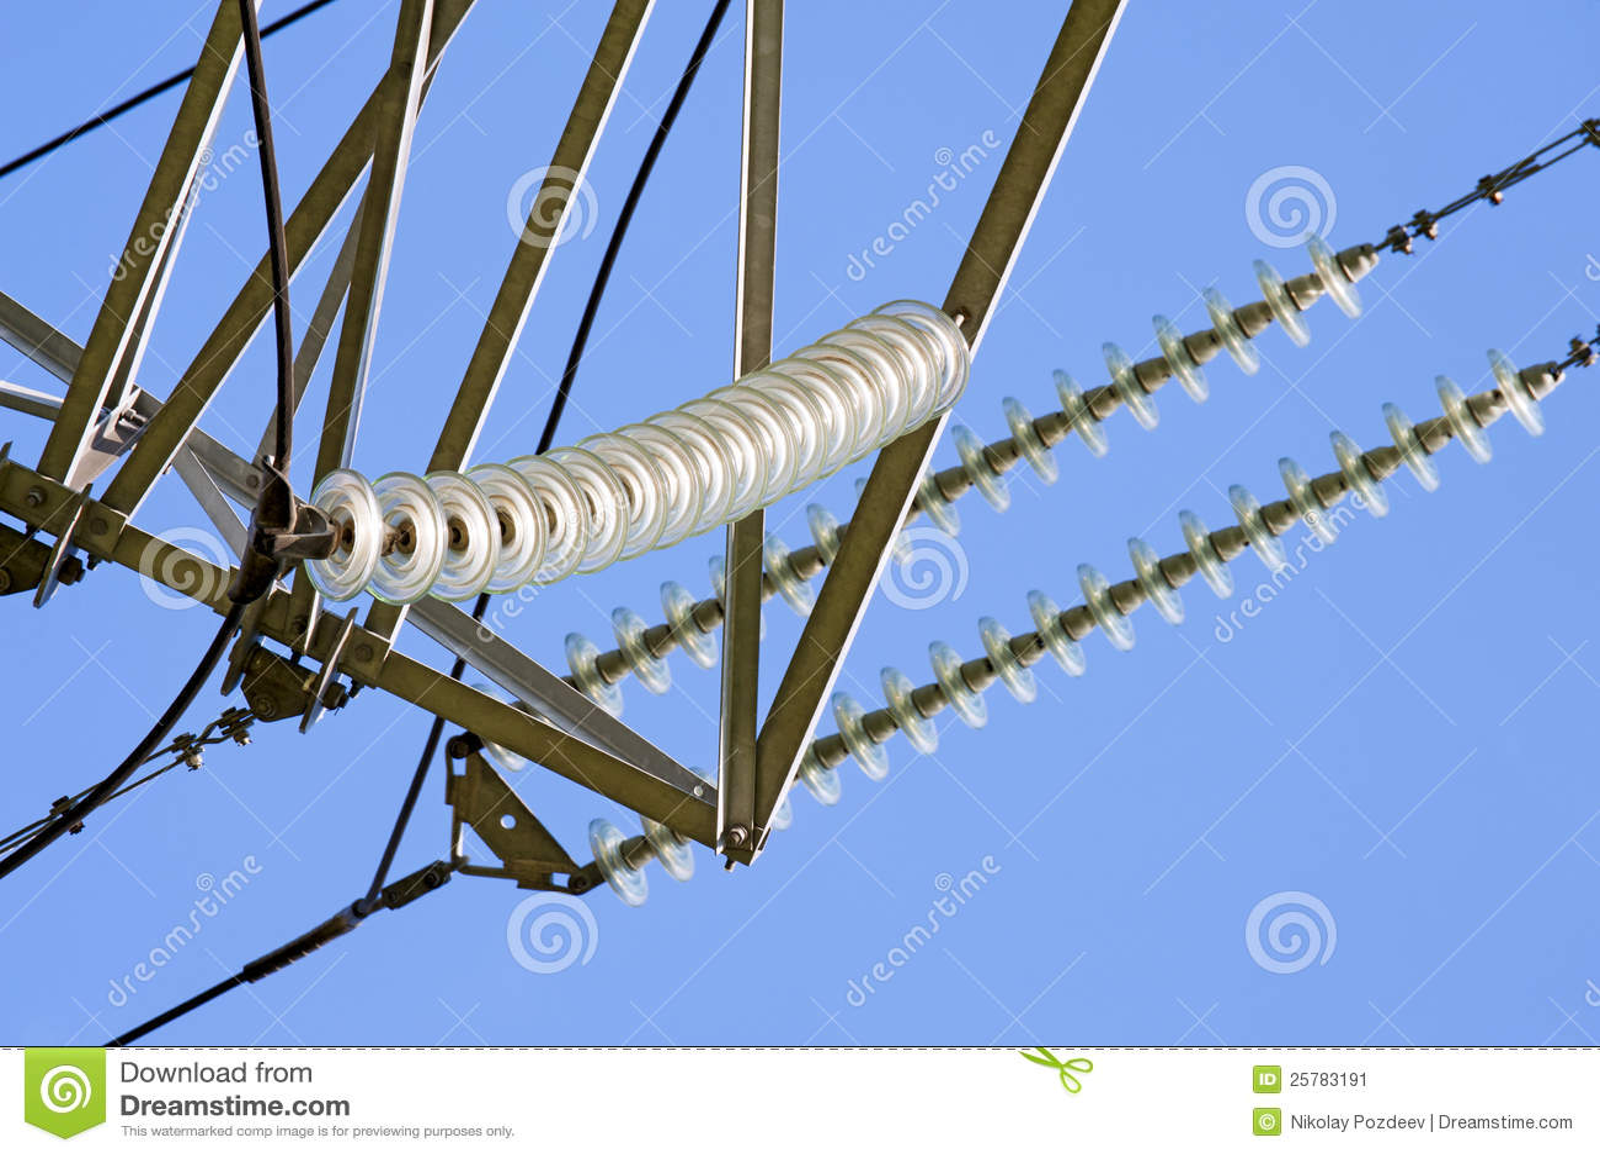 High Voltage Insulator Failures : Insulators of high voltage power lines stock image